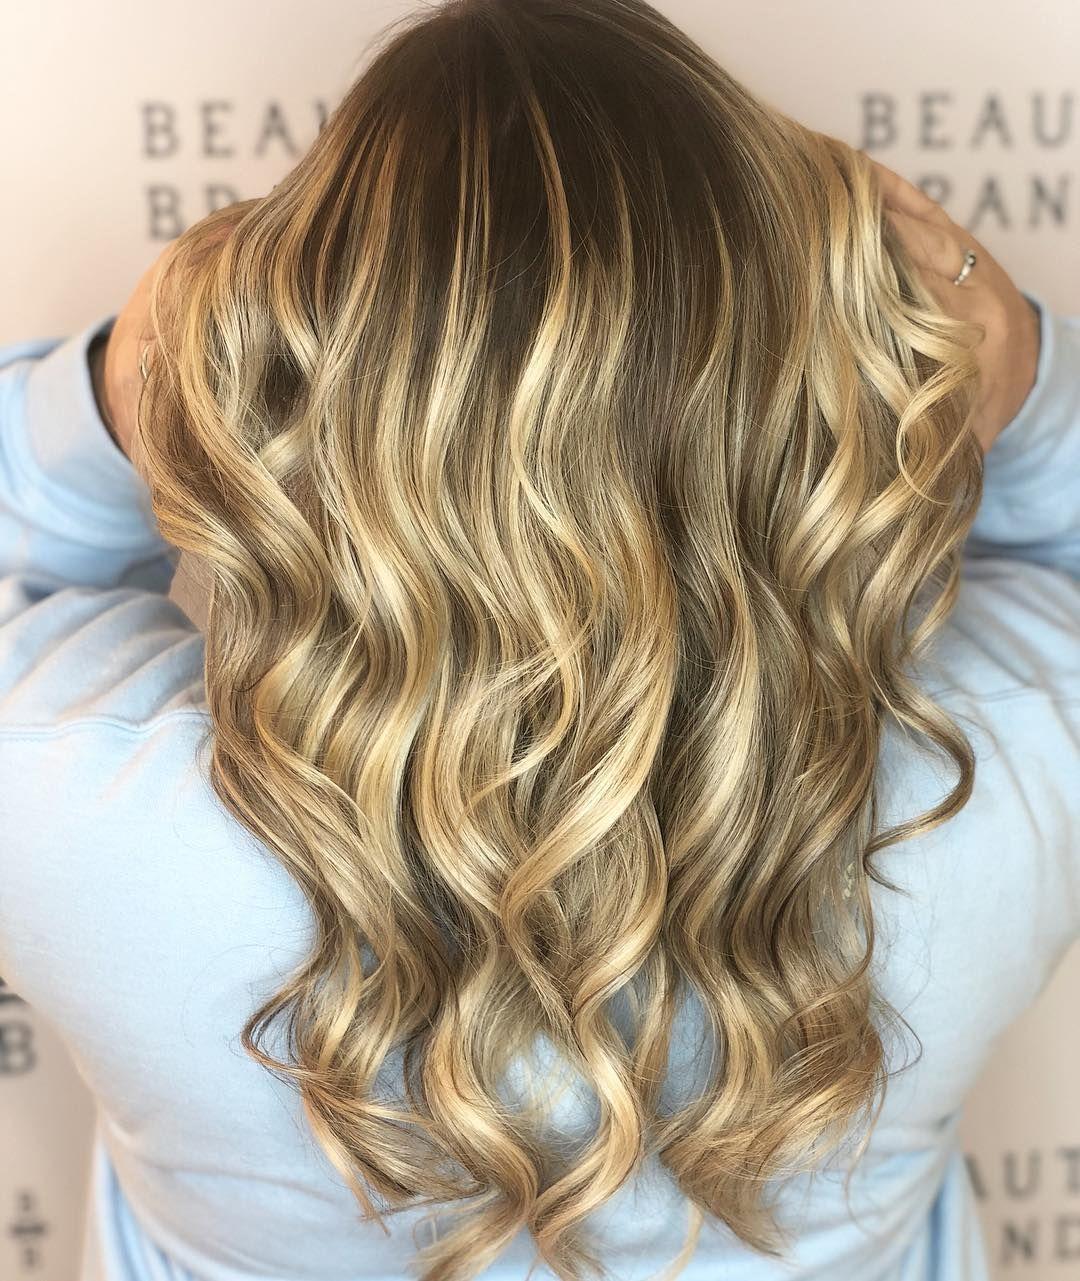 Pin by Beauty Brands on Trend Watch Honey blonde, Long